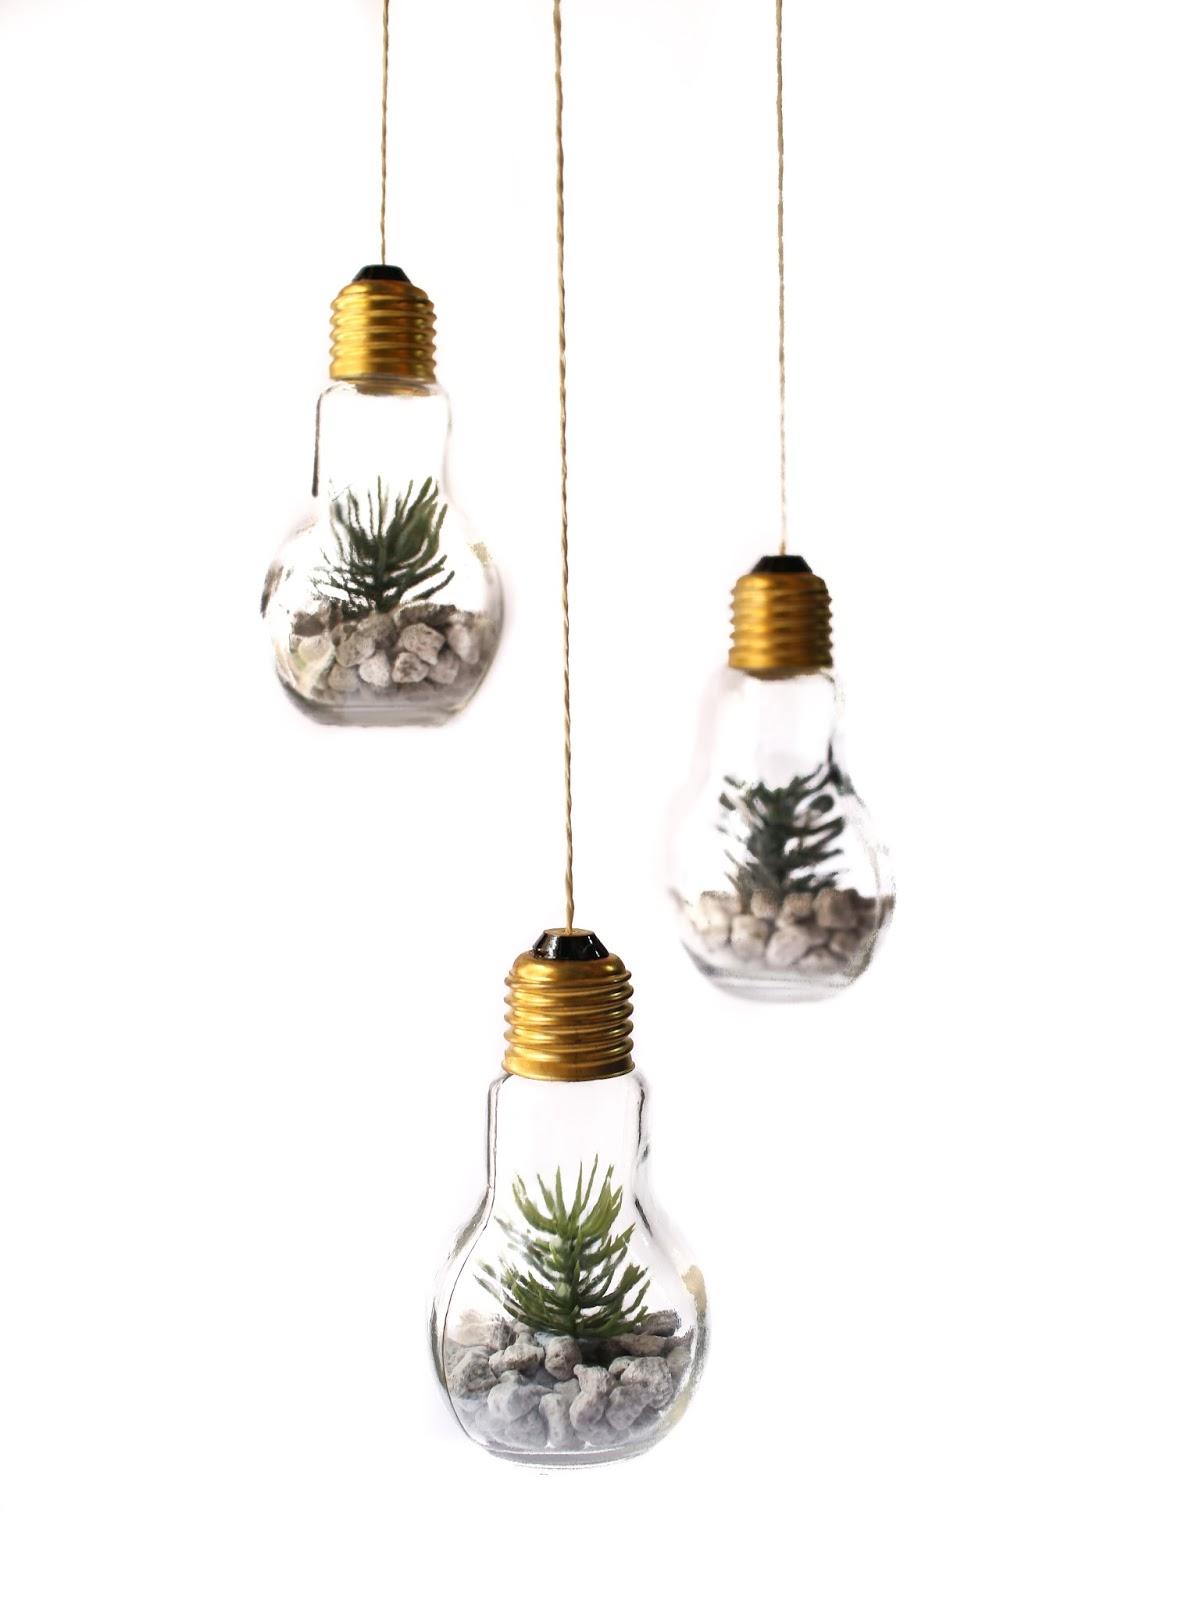 DIY Christmas Gifts under $20 - Hanging Terrarium - MONGABONG